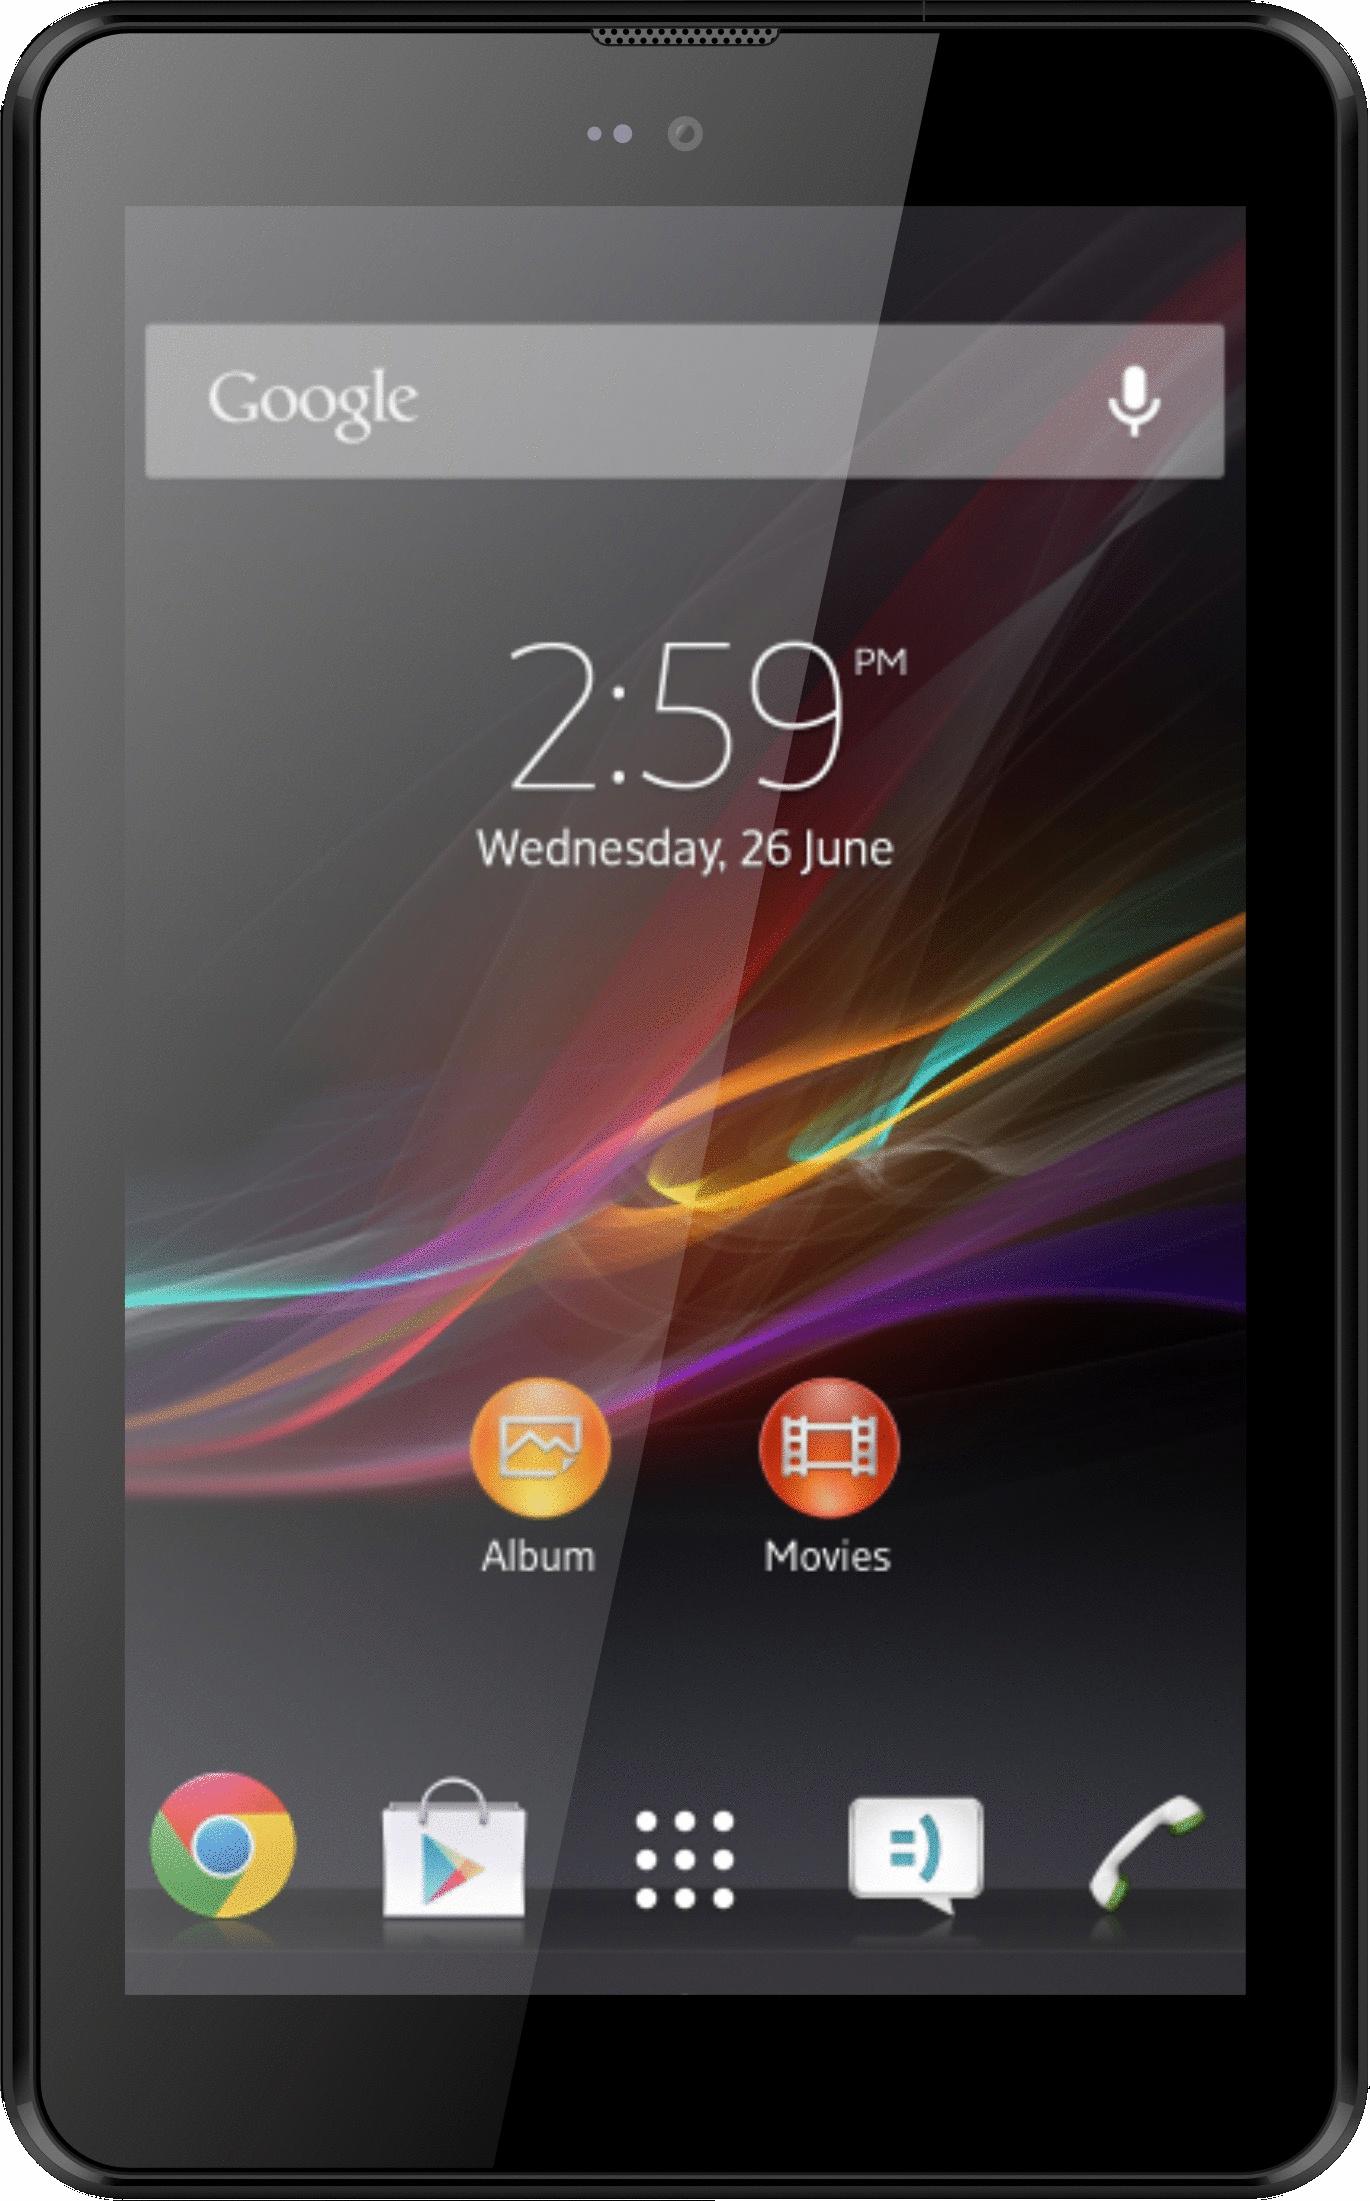 Xoro TelePAD 735Q 7 8GB [Wi-Fi + 3G, inkl. Schu...